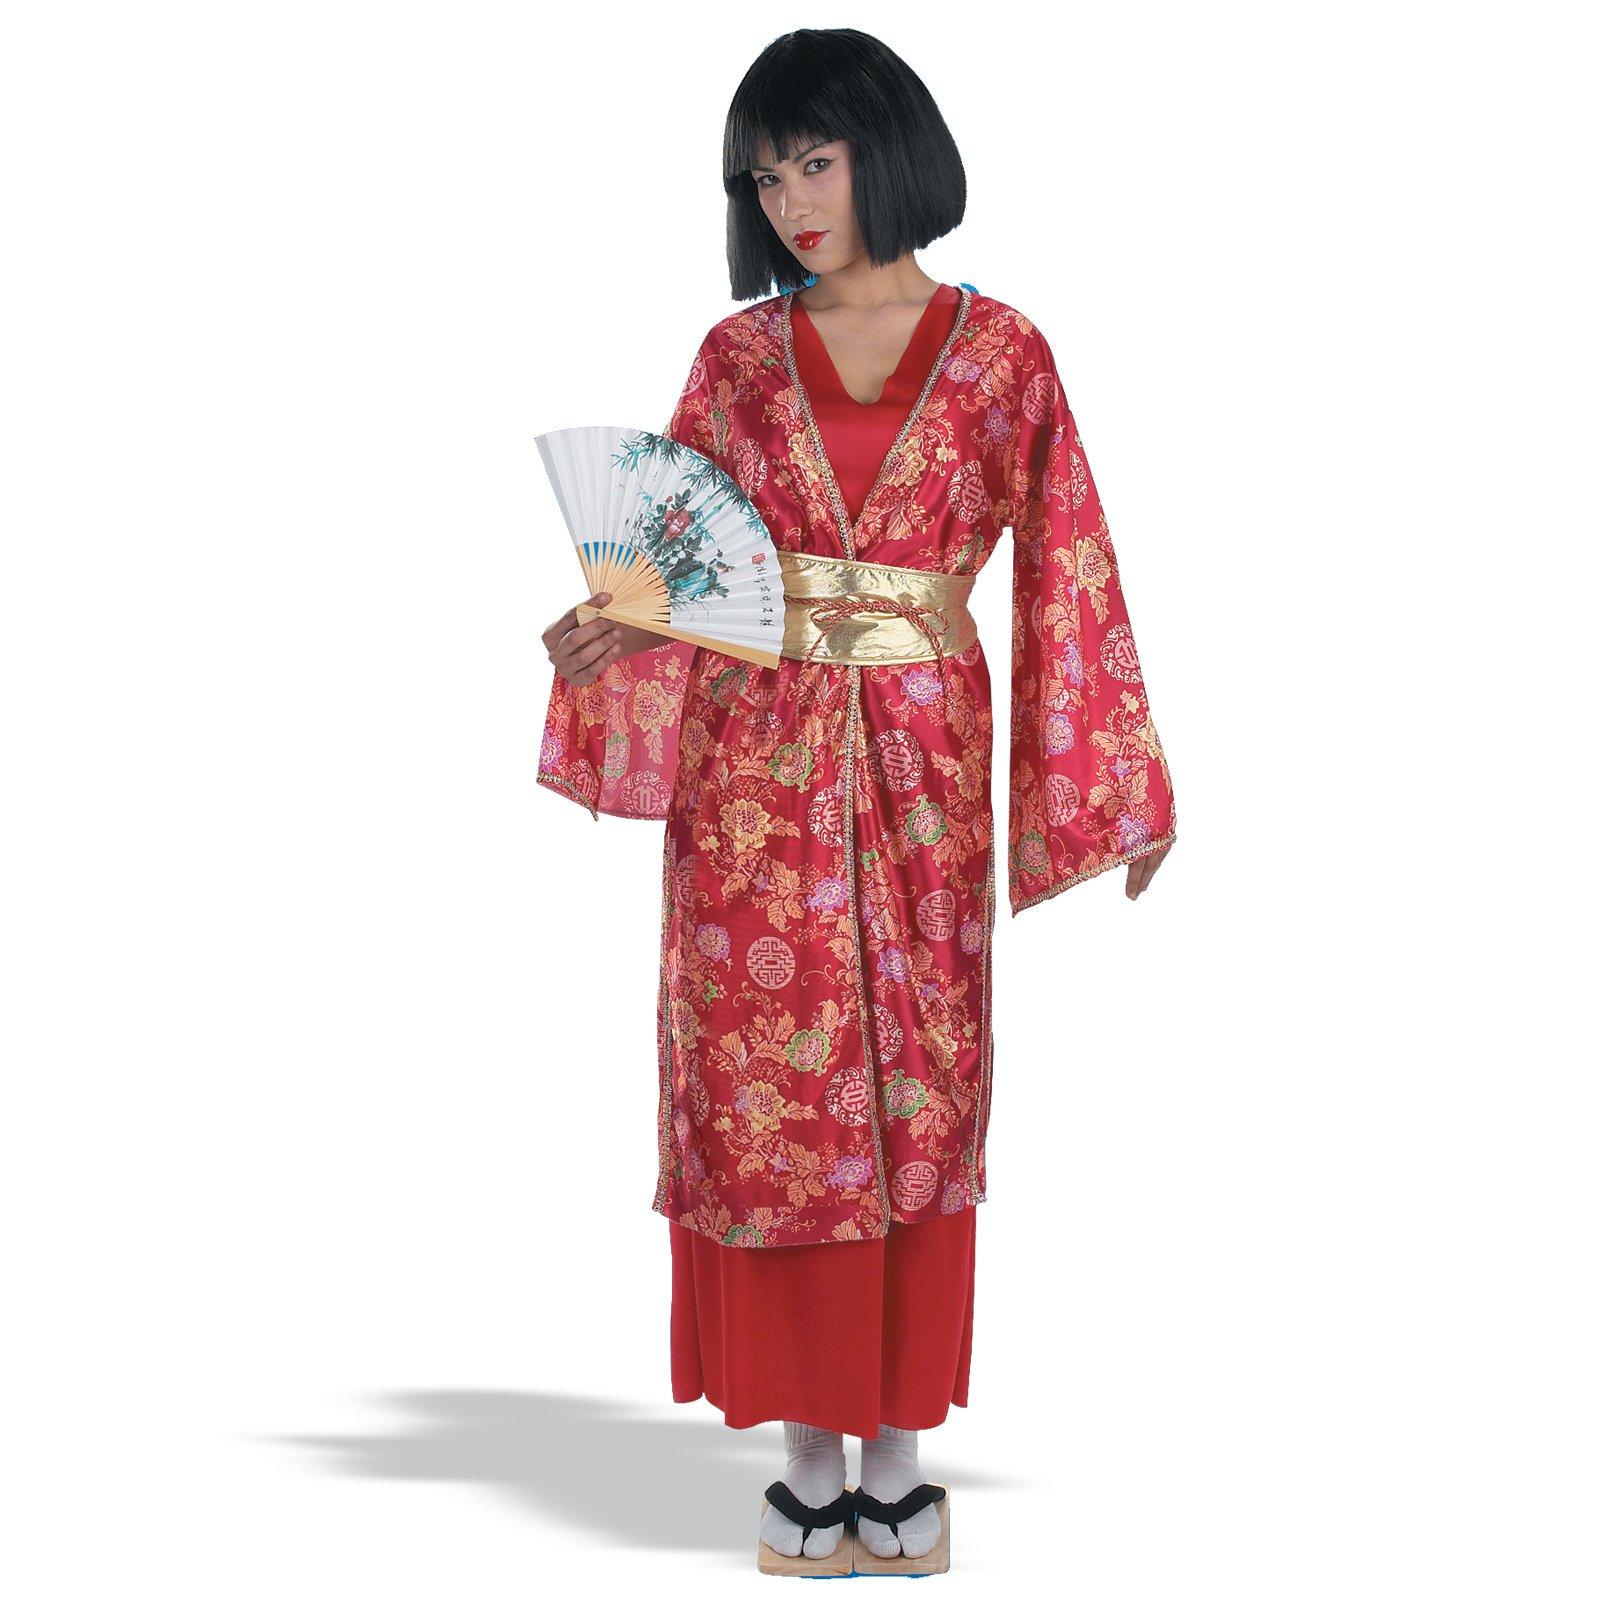 Buy Cheap Geisha Adult Costume - 100% Polyester